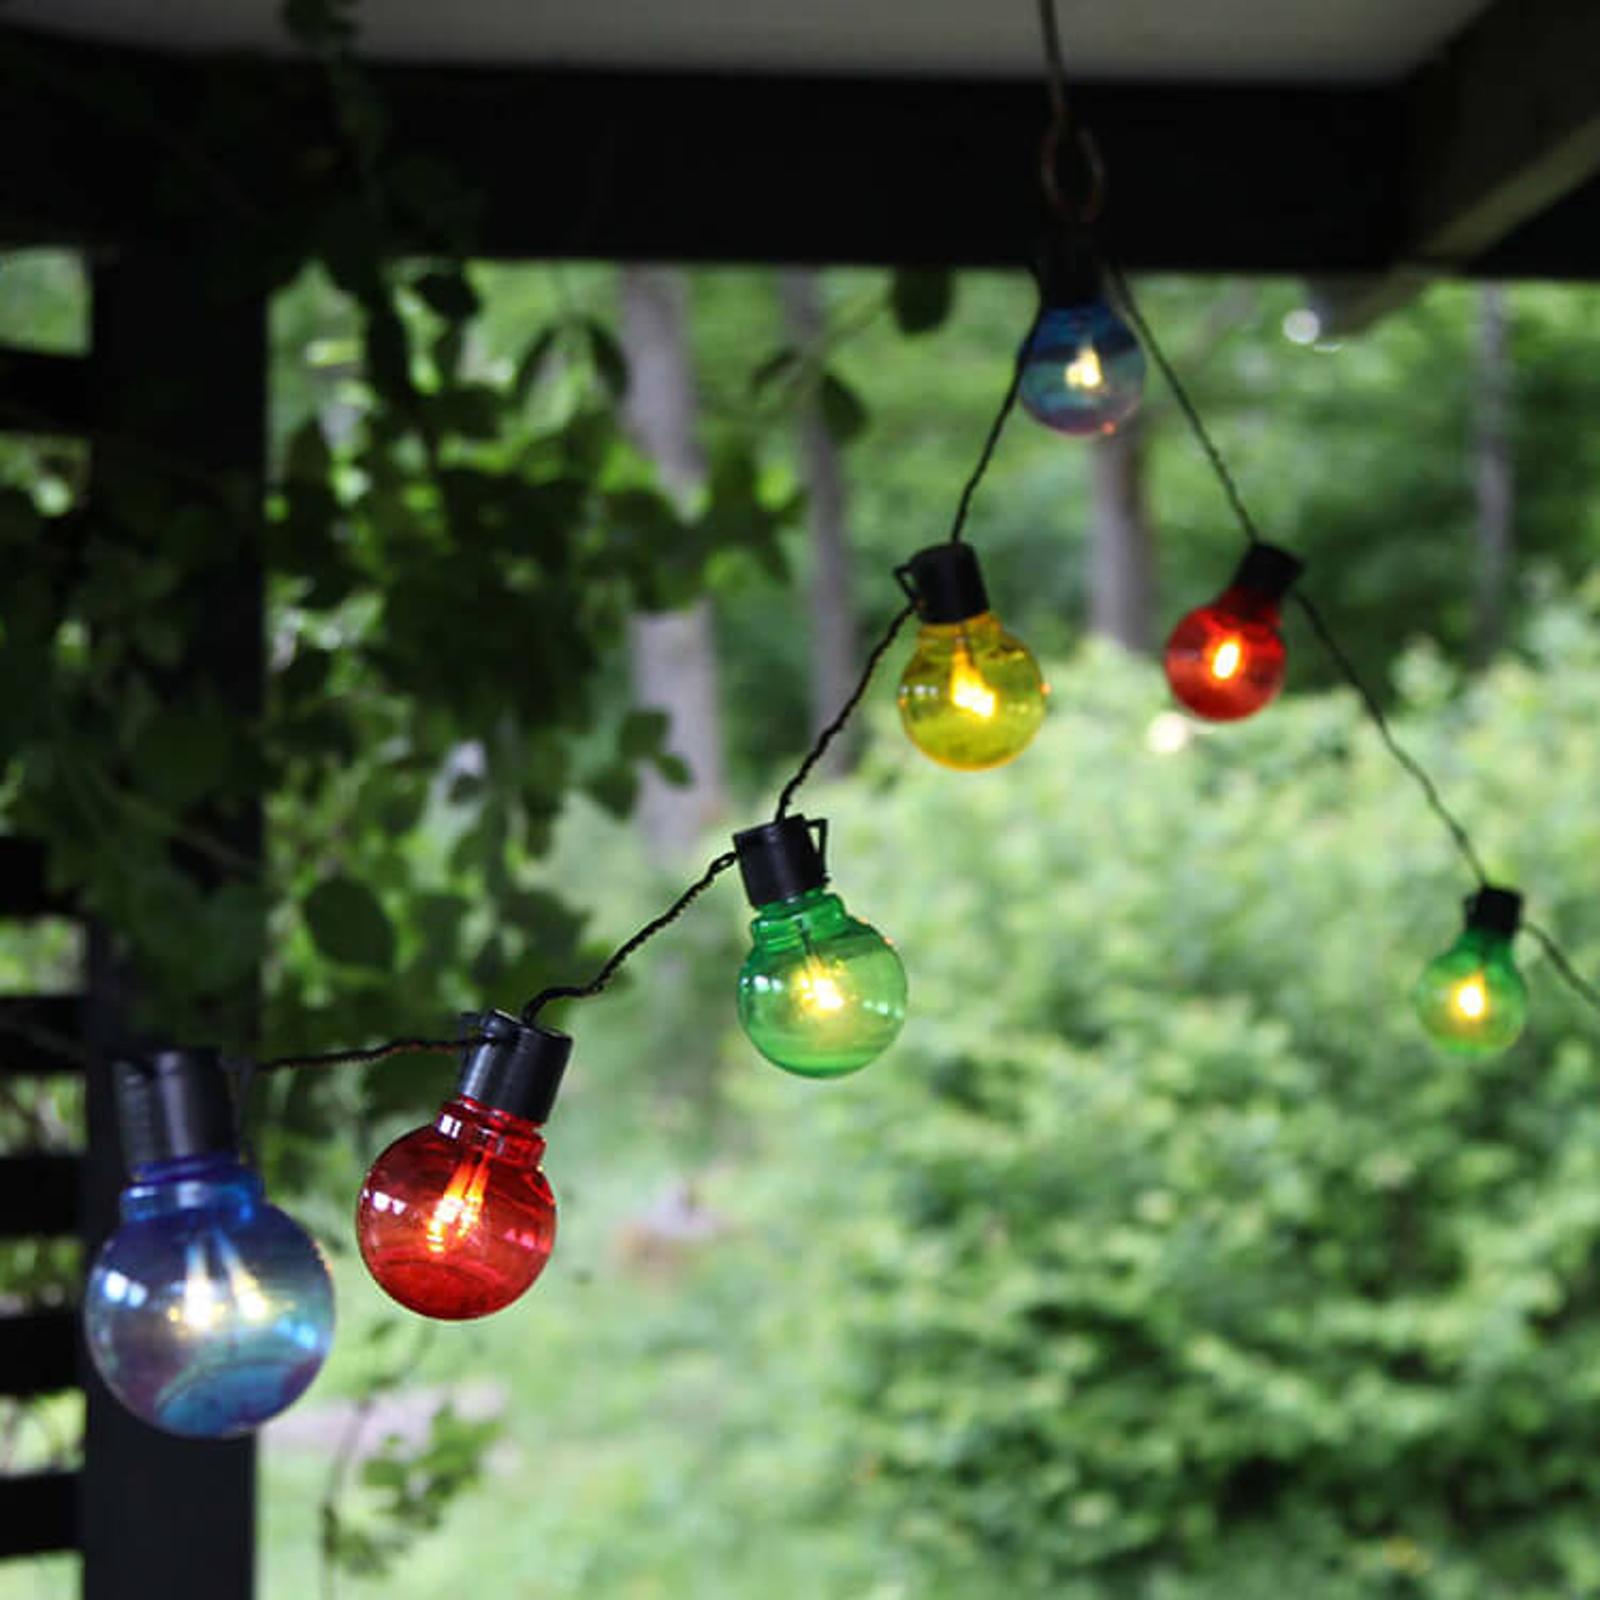 Bunte LED-Lichterkette Partaj, mit 16 Lampen